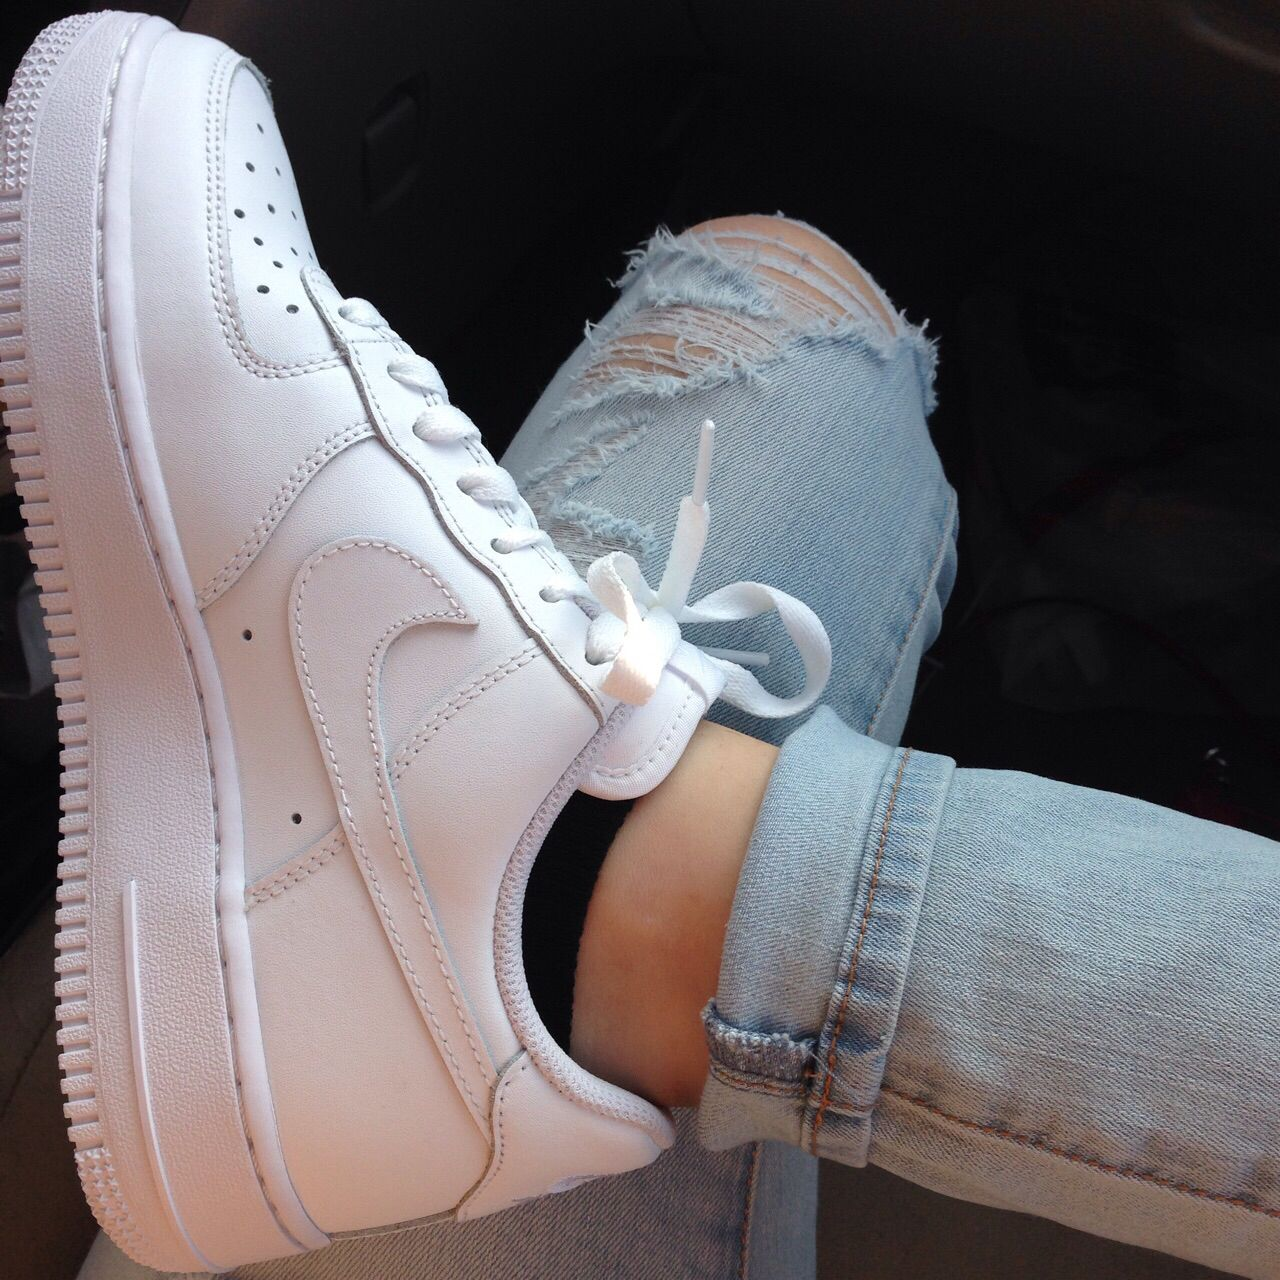 shoes19 on Footwear Pinterest Nike shoe, Woman and Runway fashion